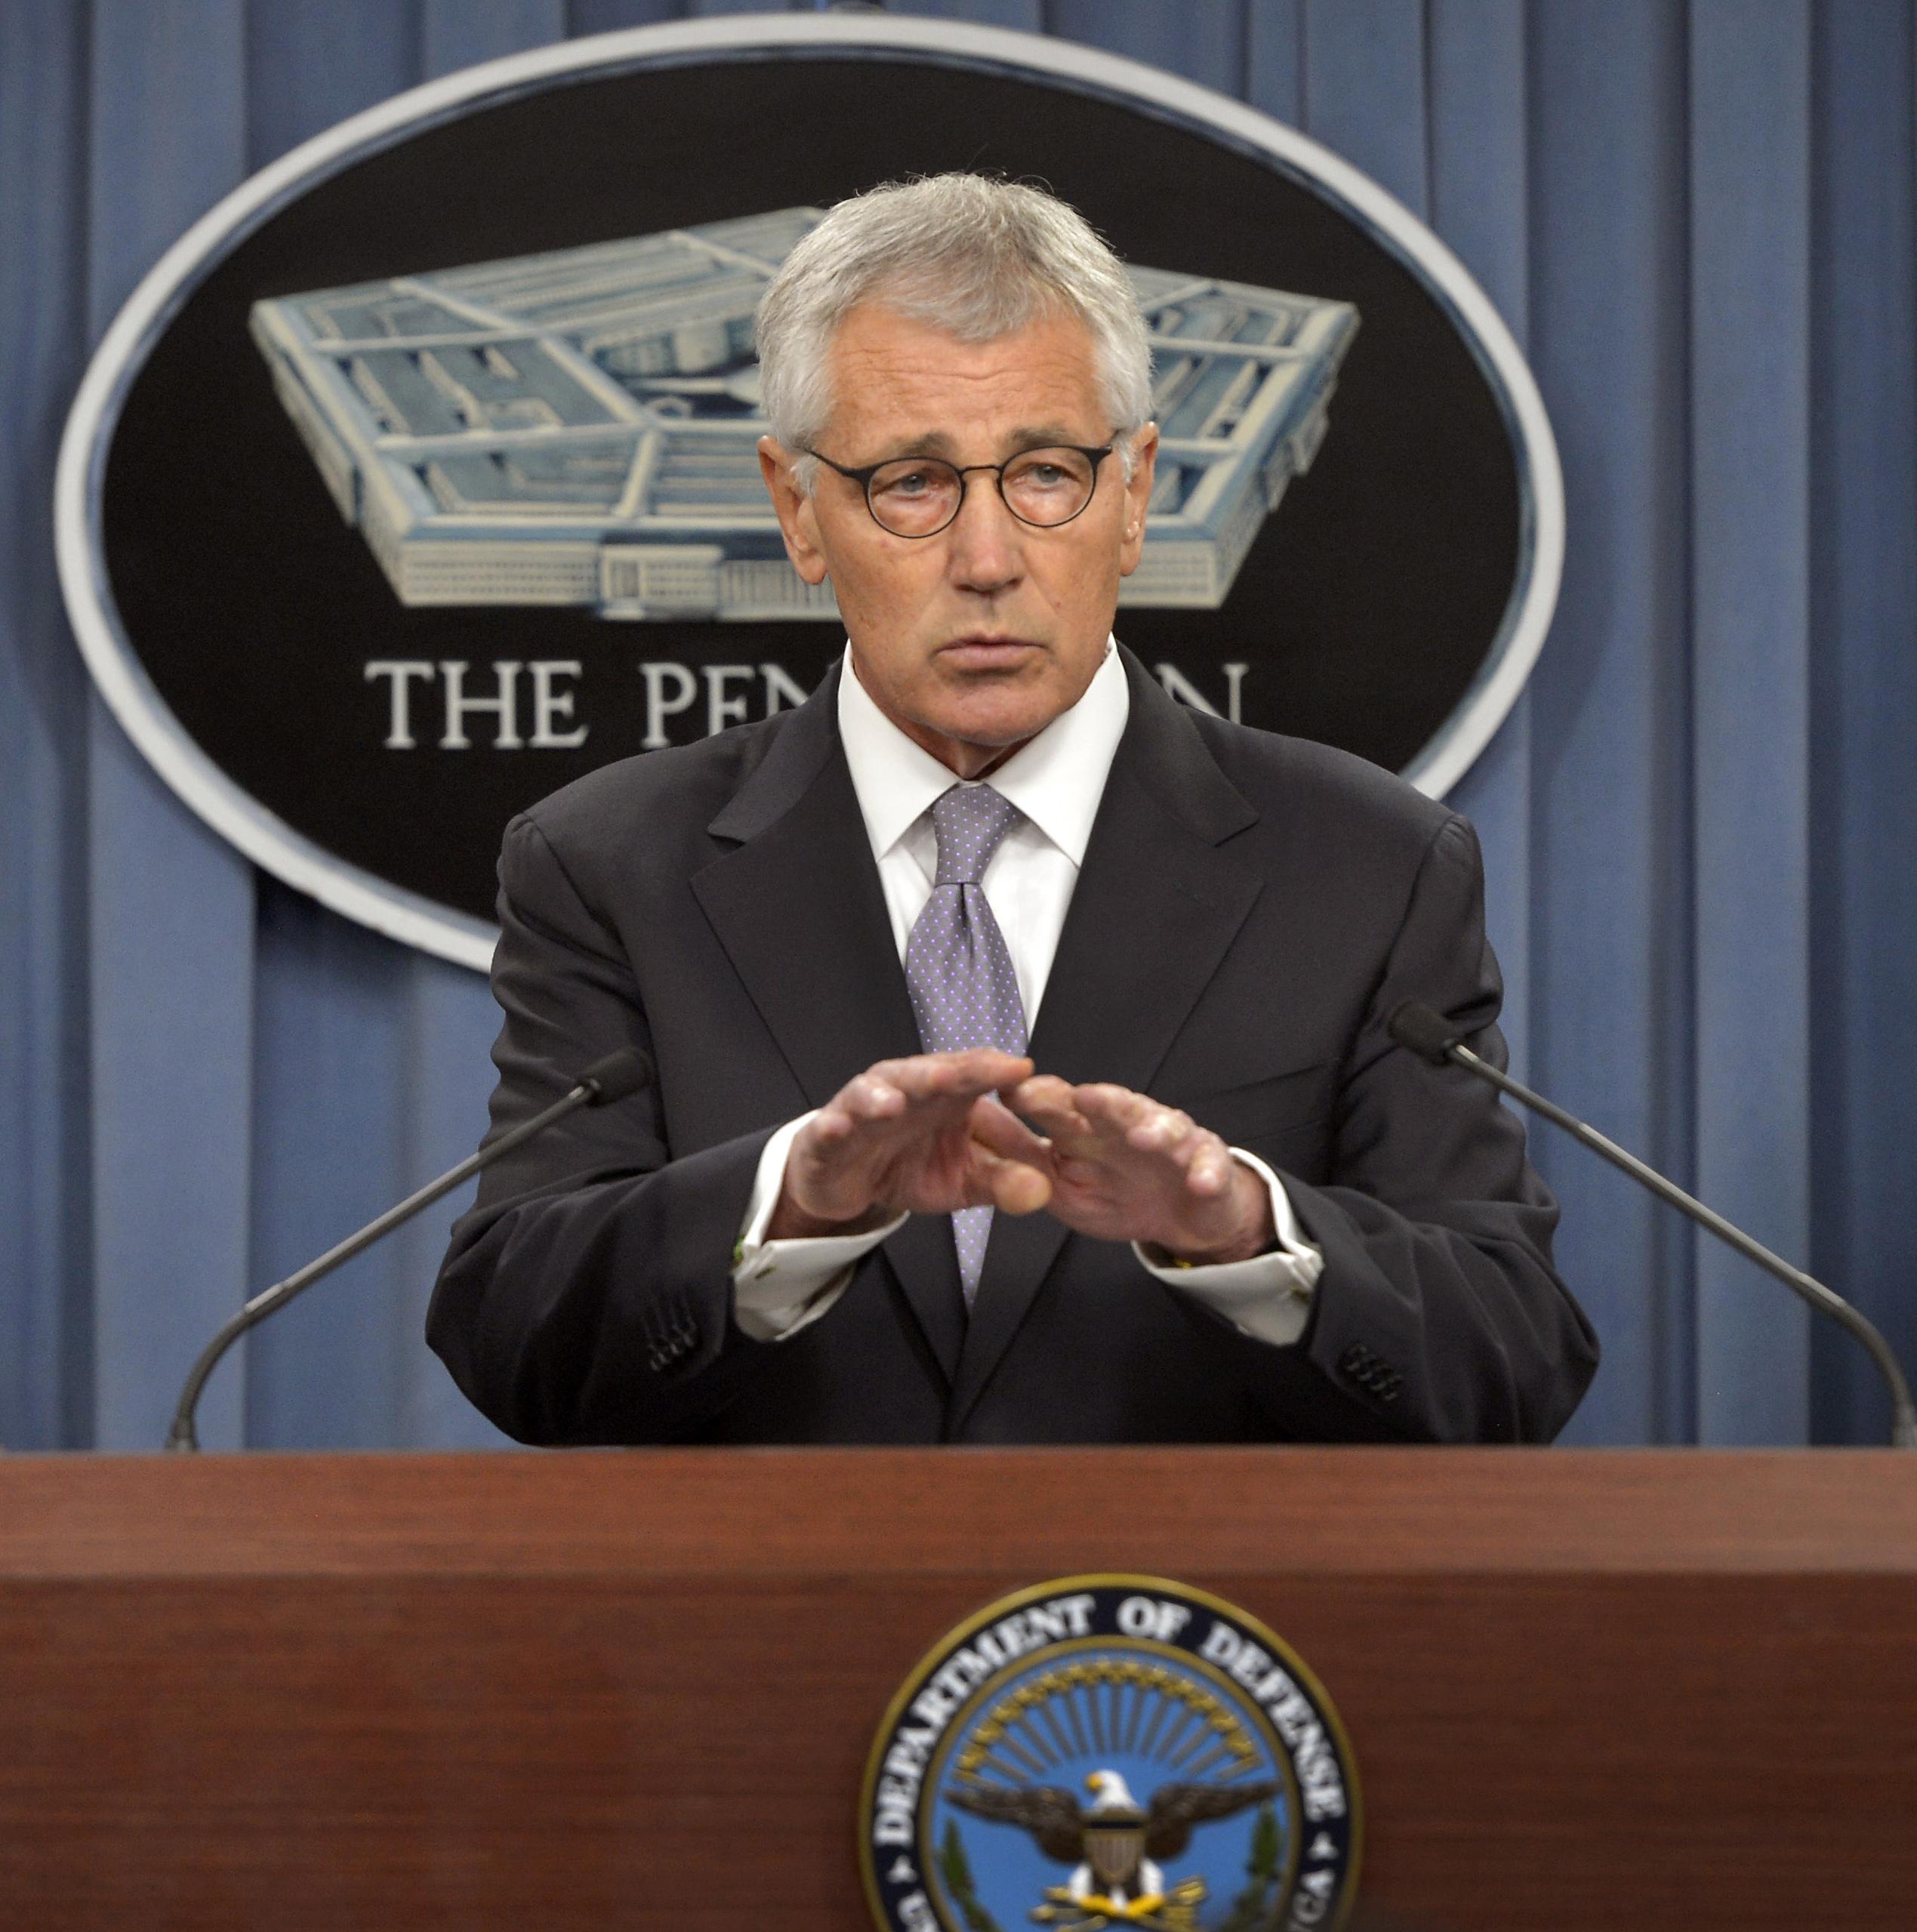 Secretary of Defense Chuck Hagel on Oct. 1, 2014. DoD Photo